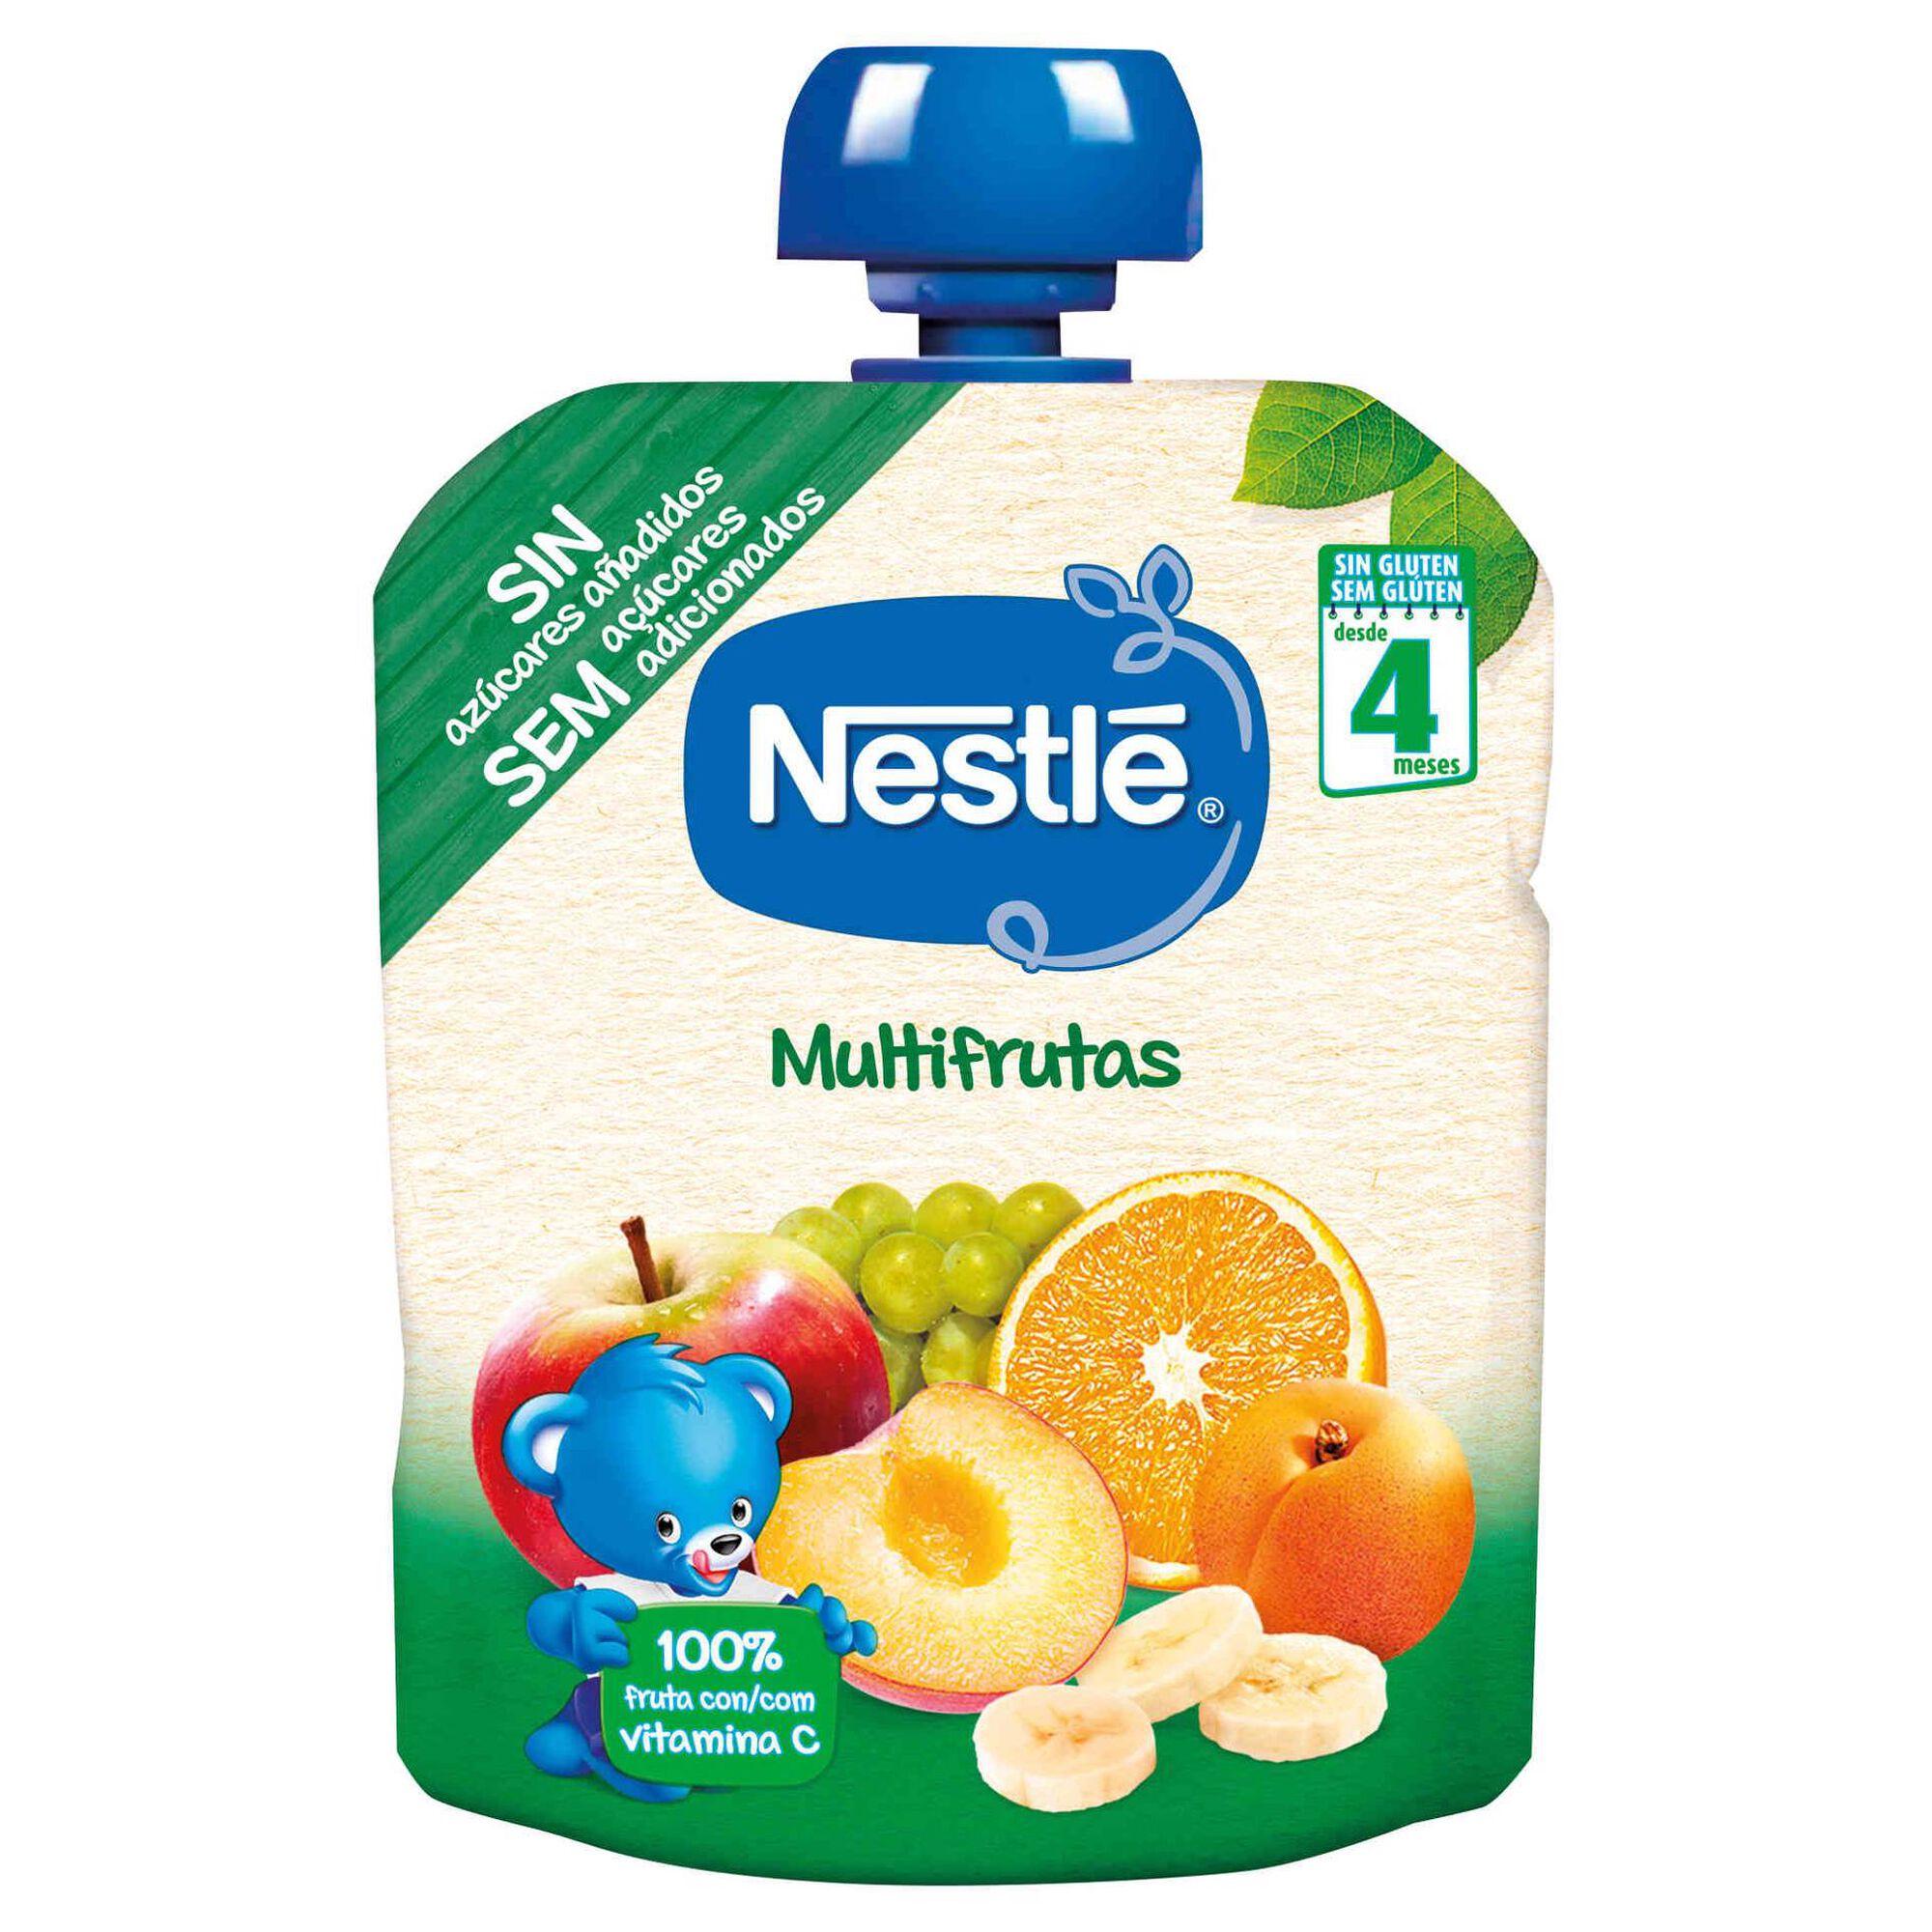 Saqueta de Fruta Multrifrutas sem Glúten +4 Meses